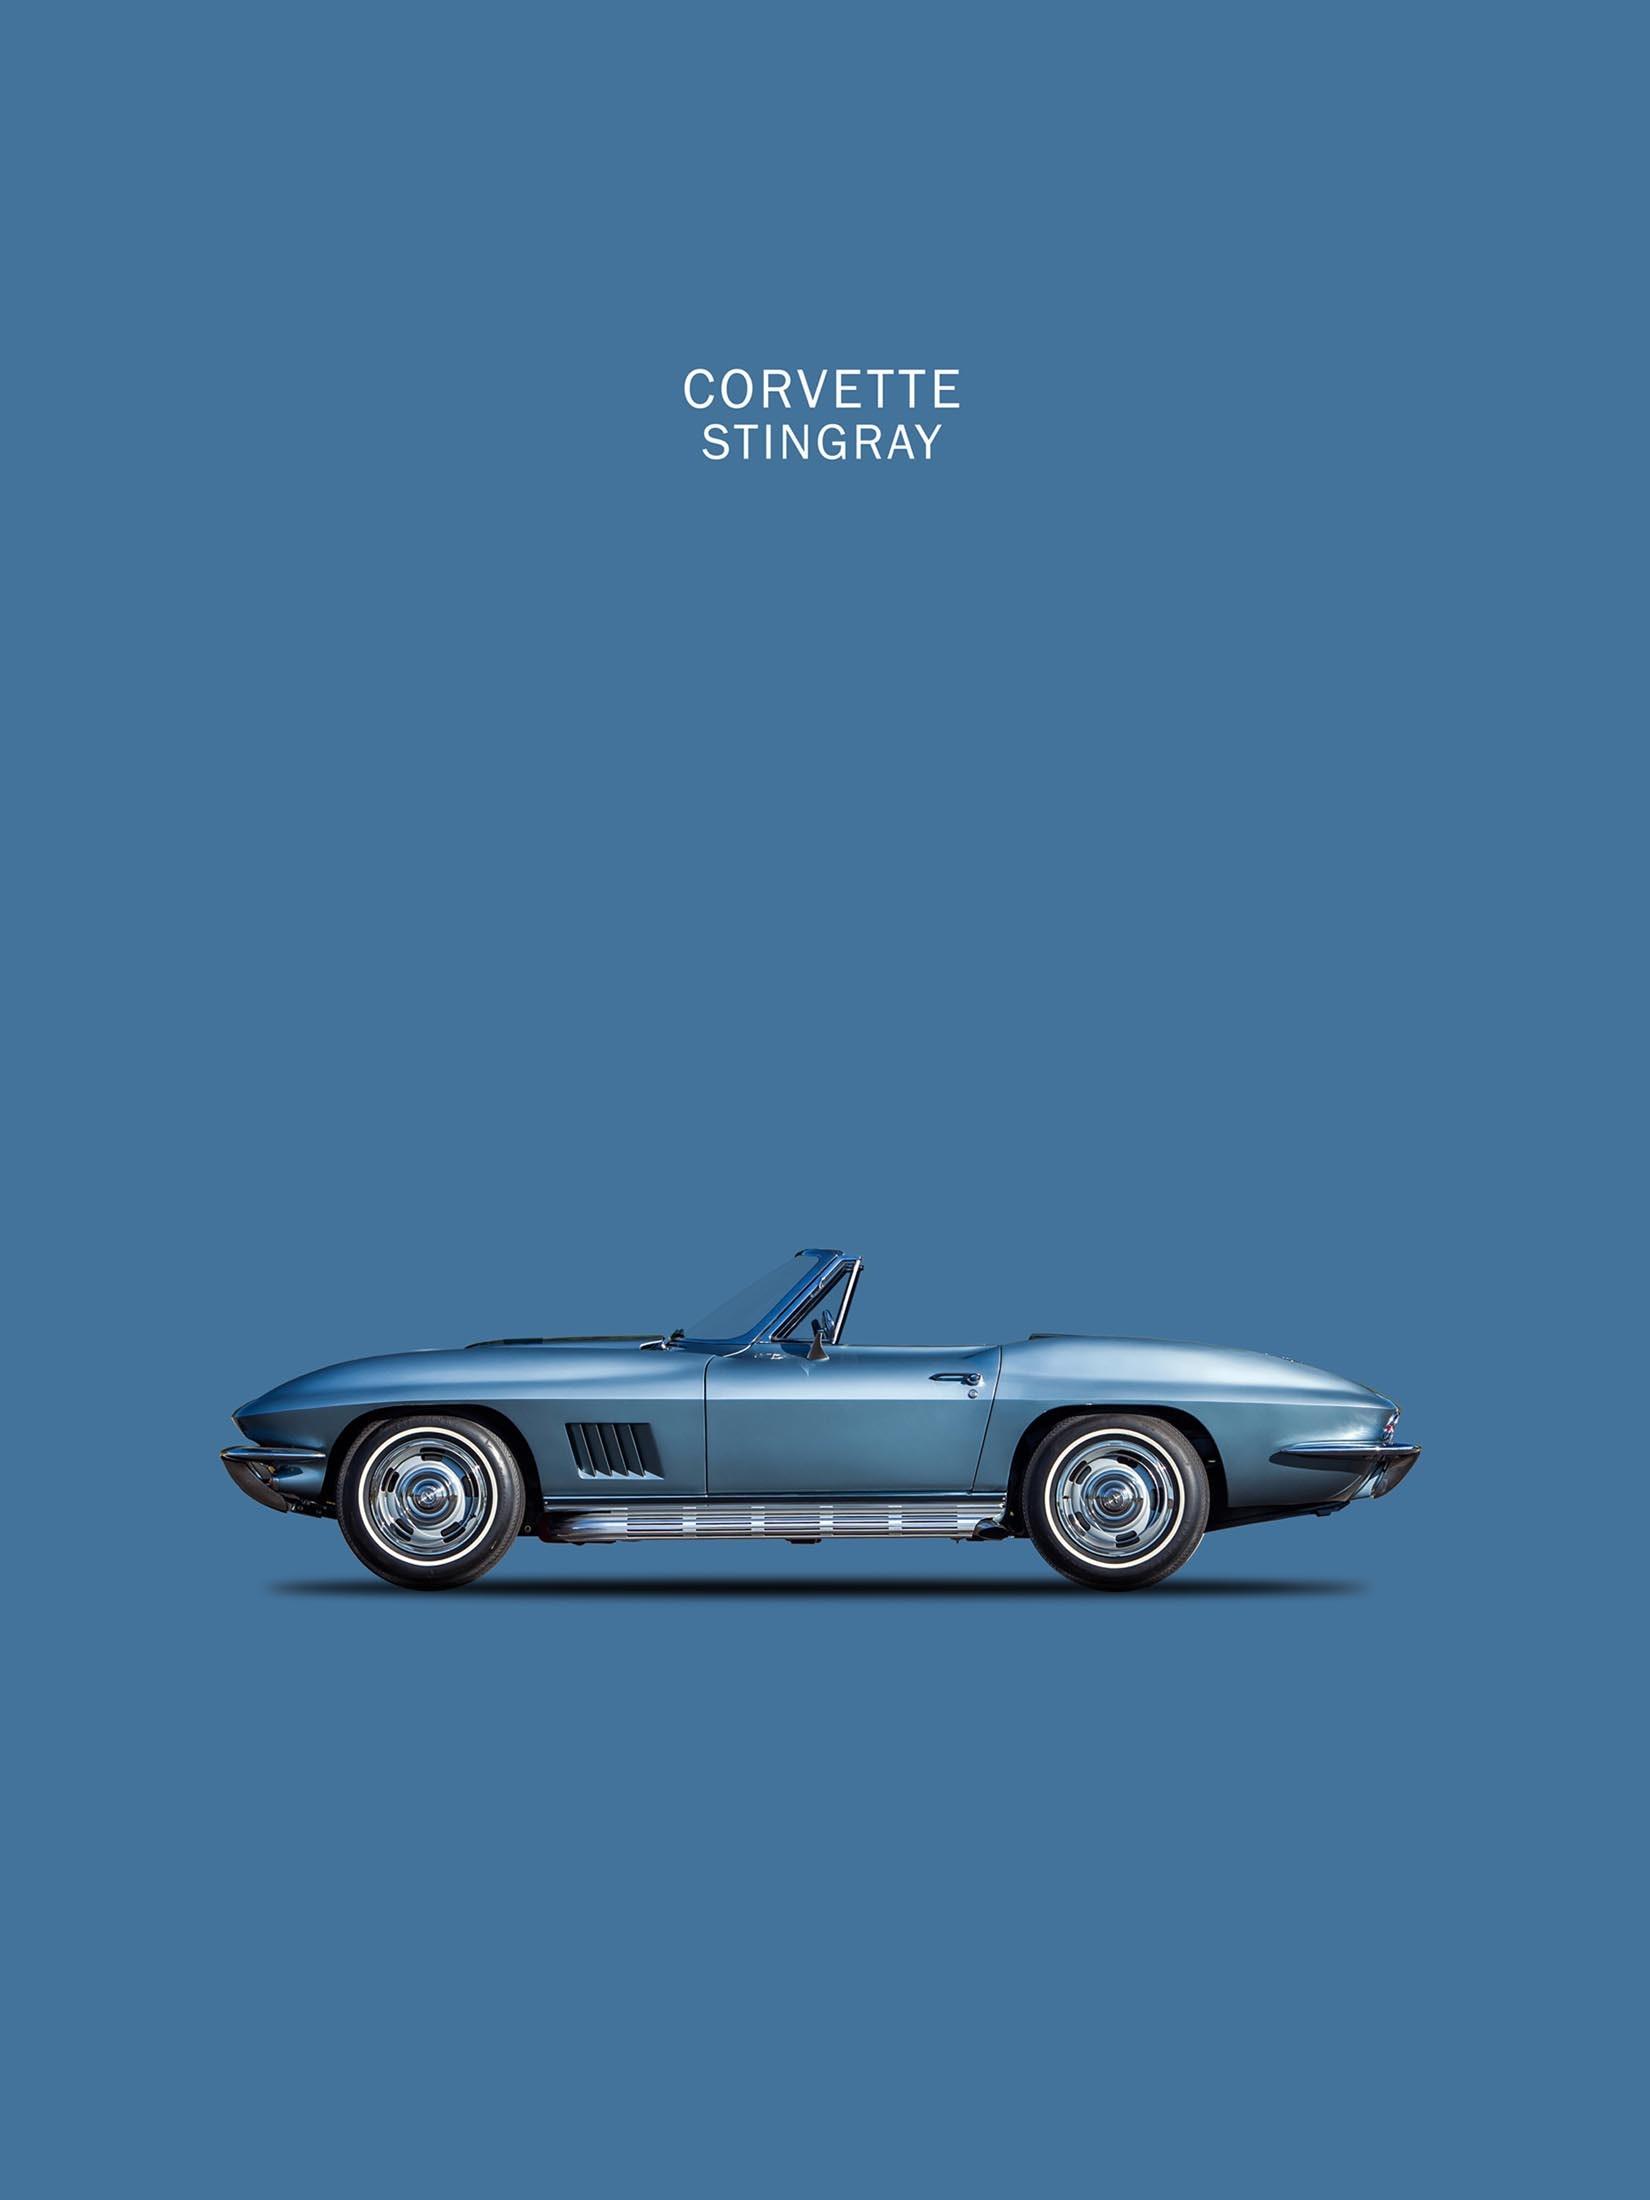 Corvette Stingray C2